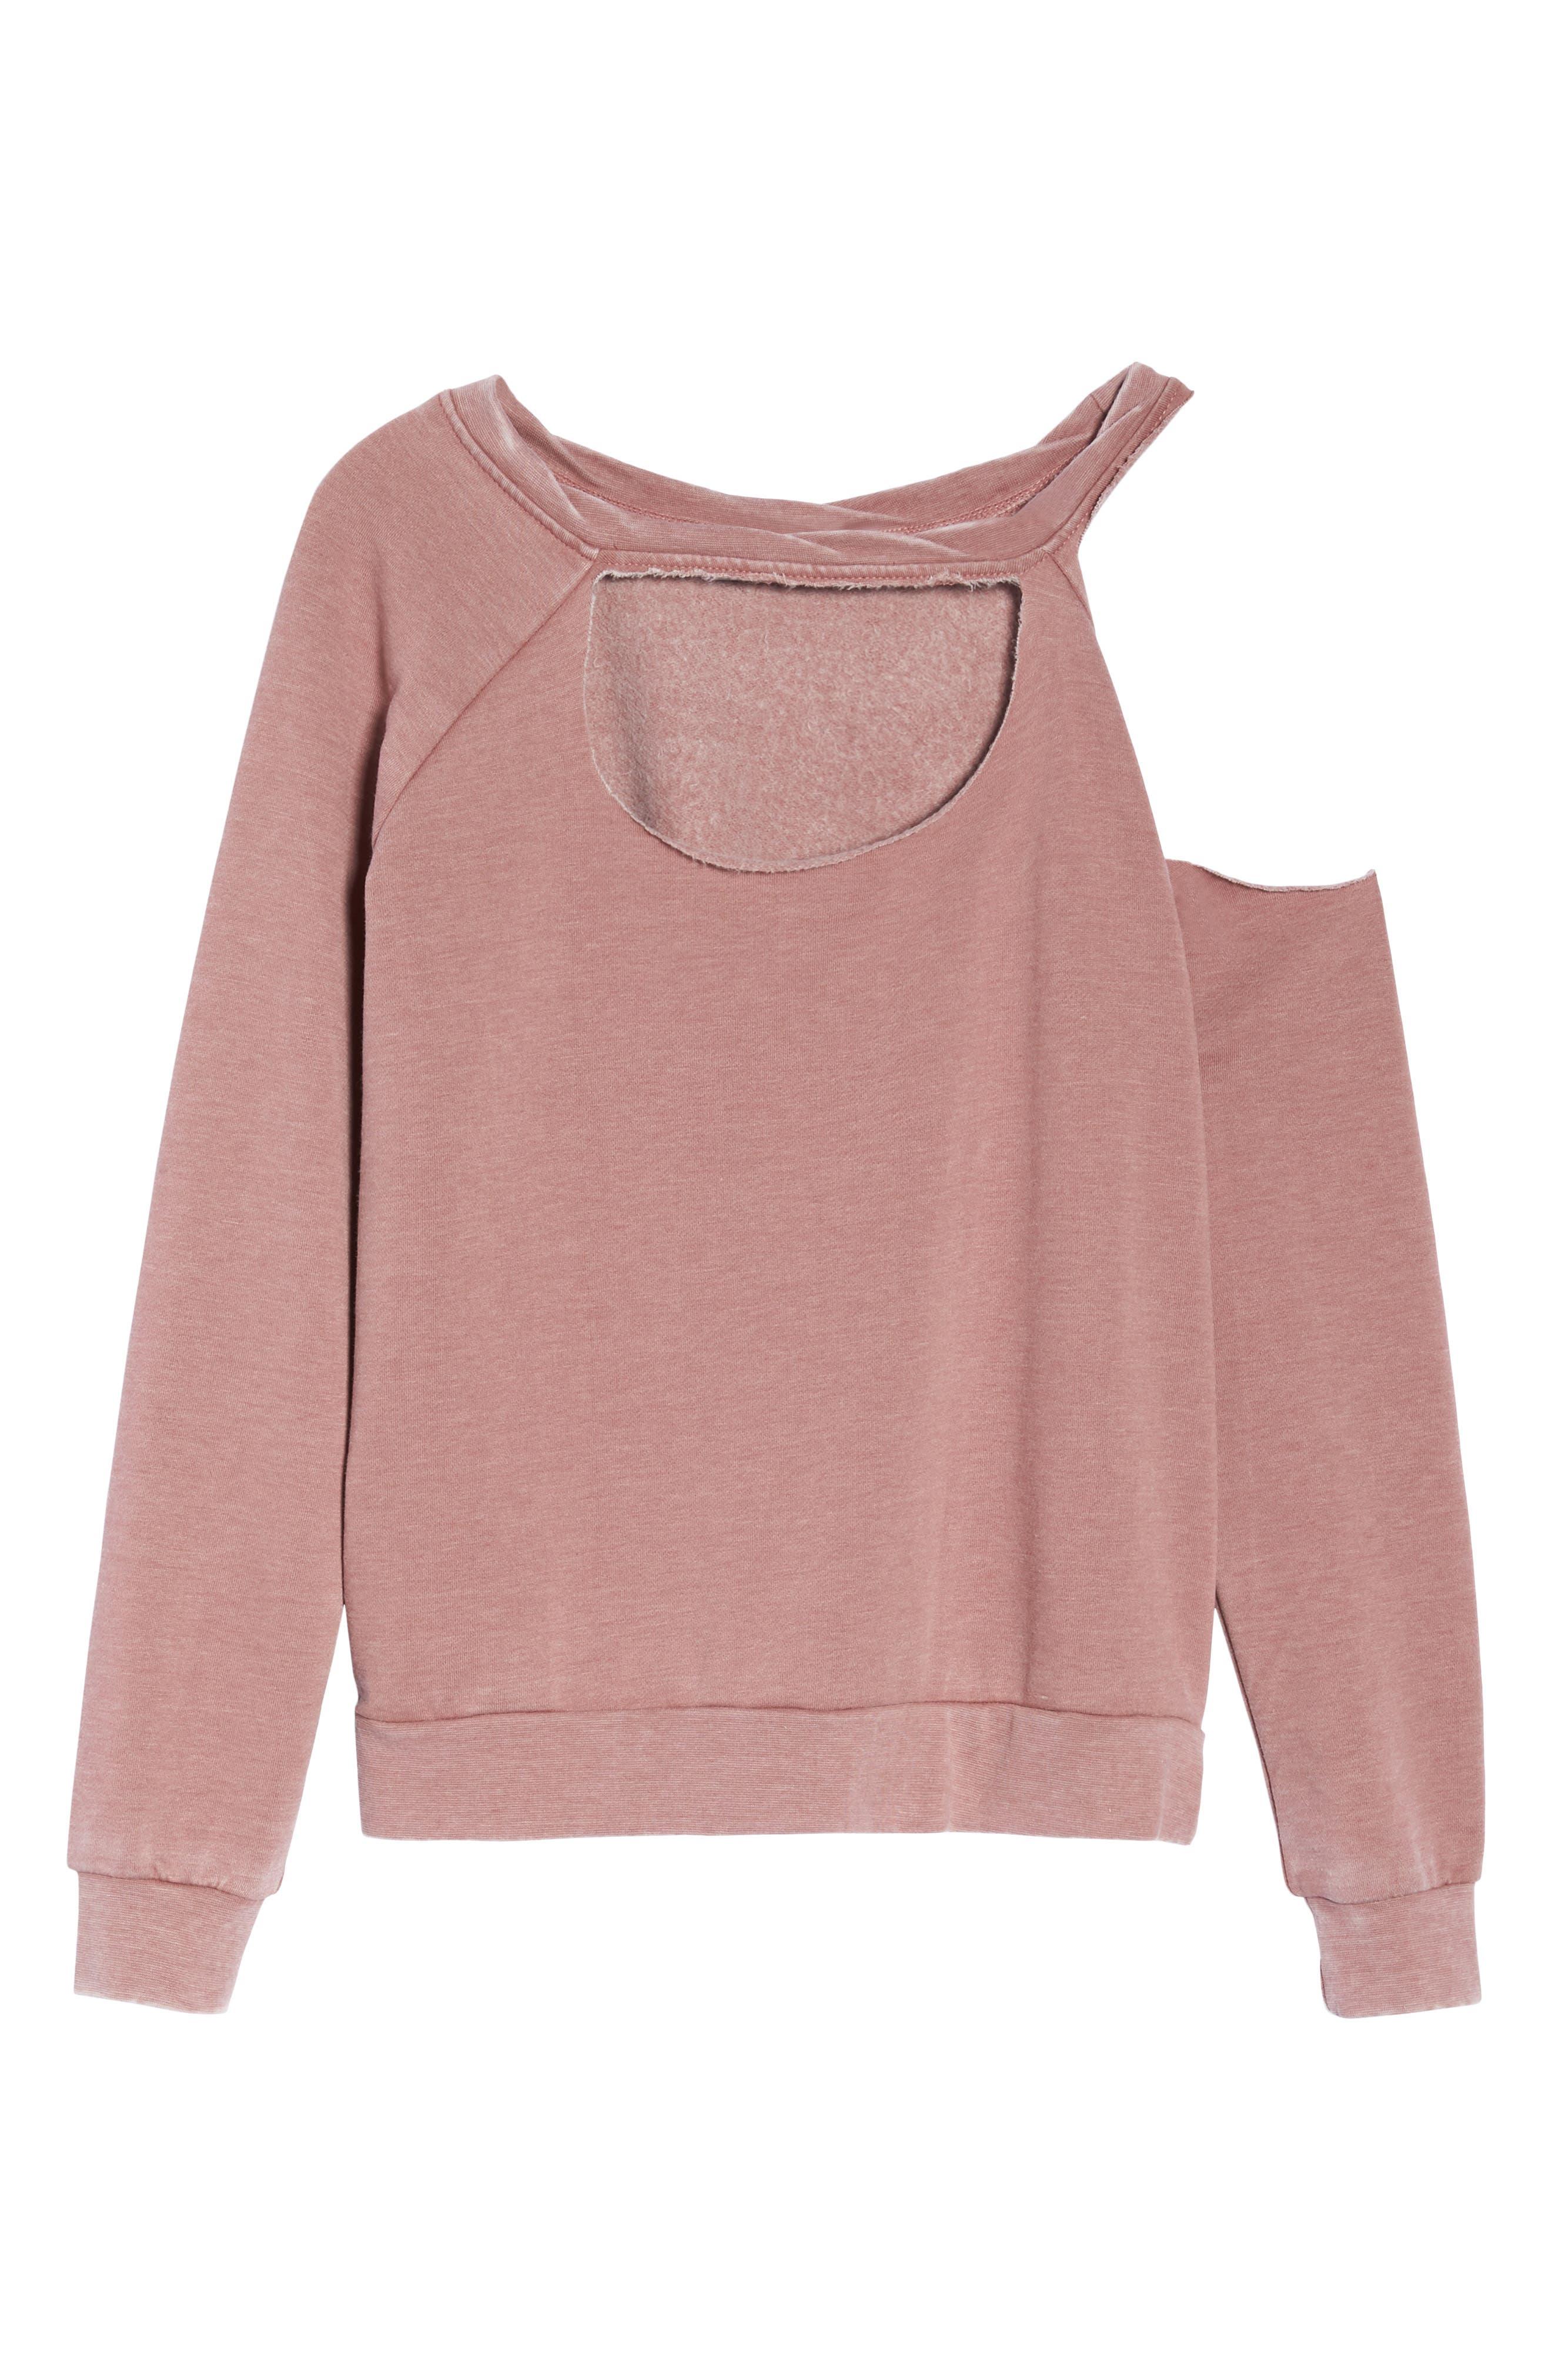 Colder Destroyed Sweatshirt,                             Alternate thumbnail 6, color,                             930